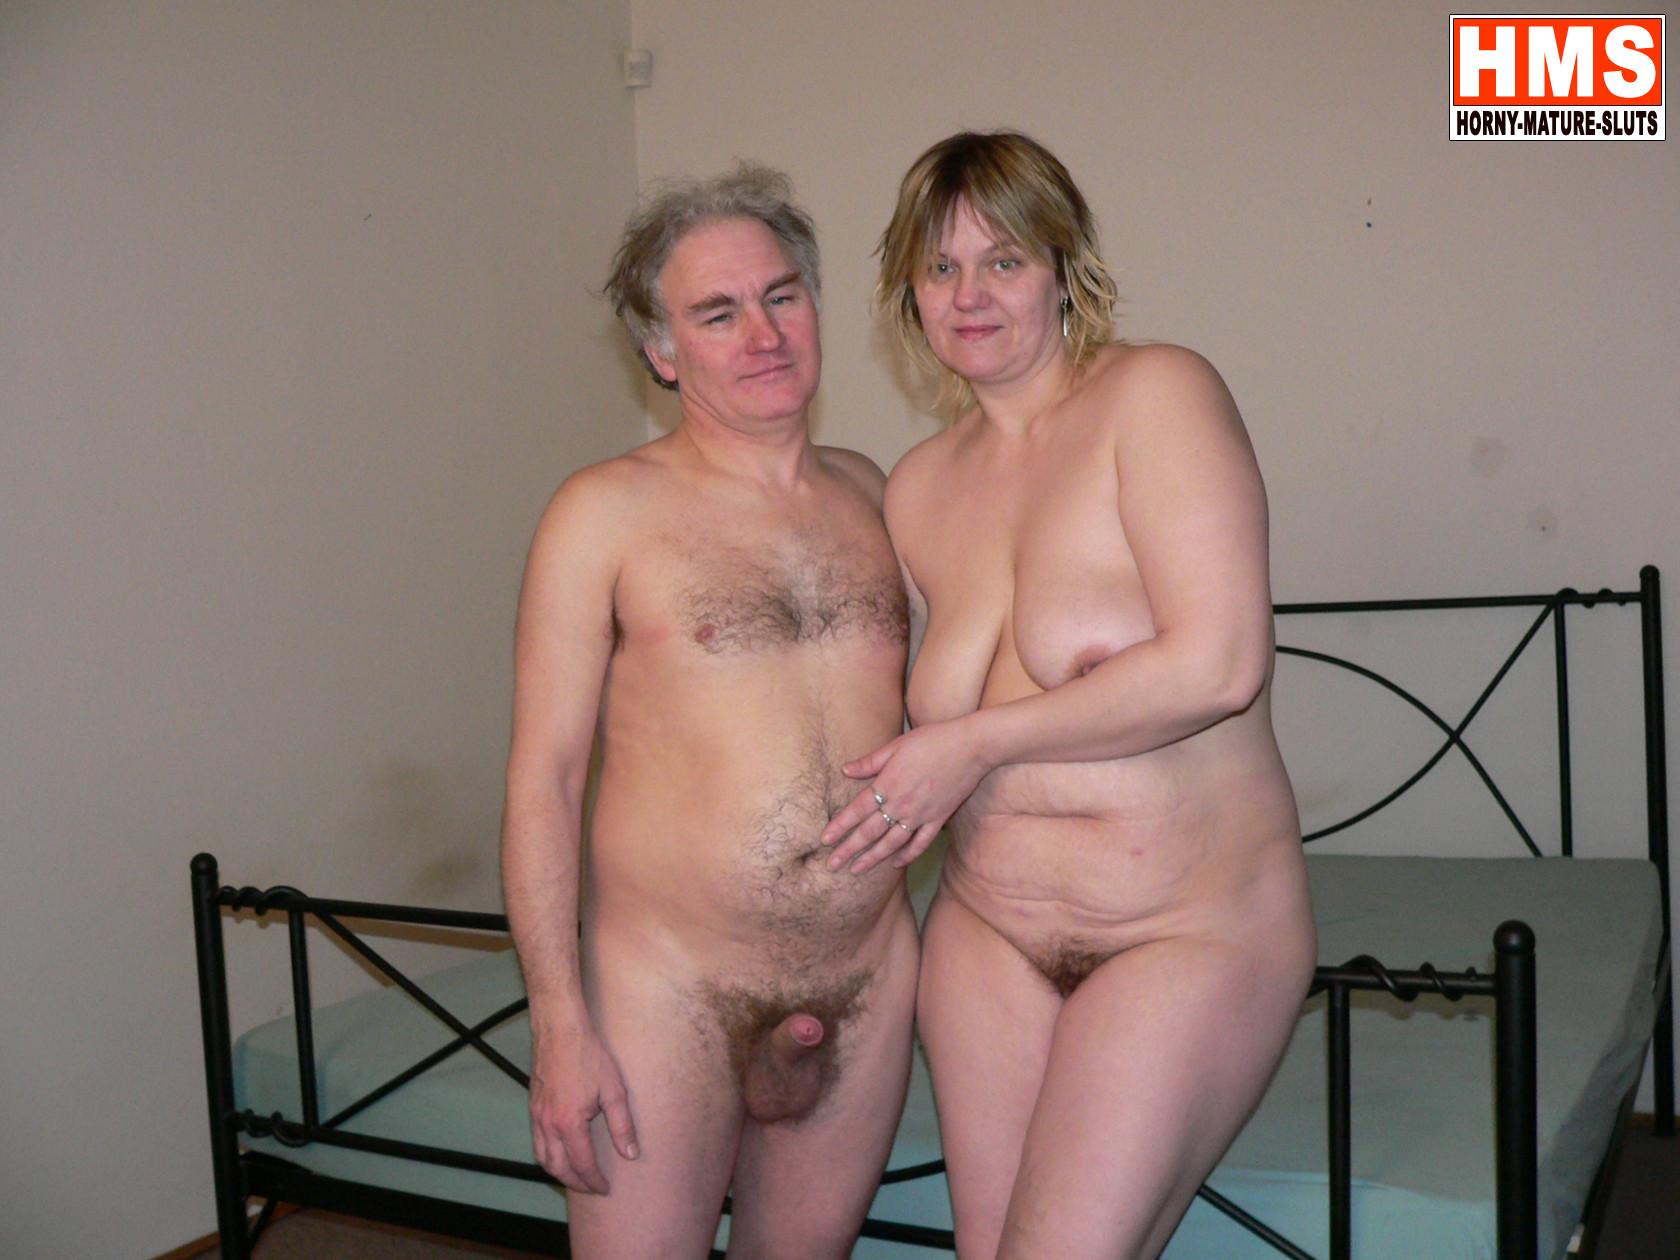 Hot petite nude blonde girls